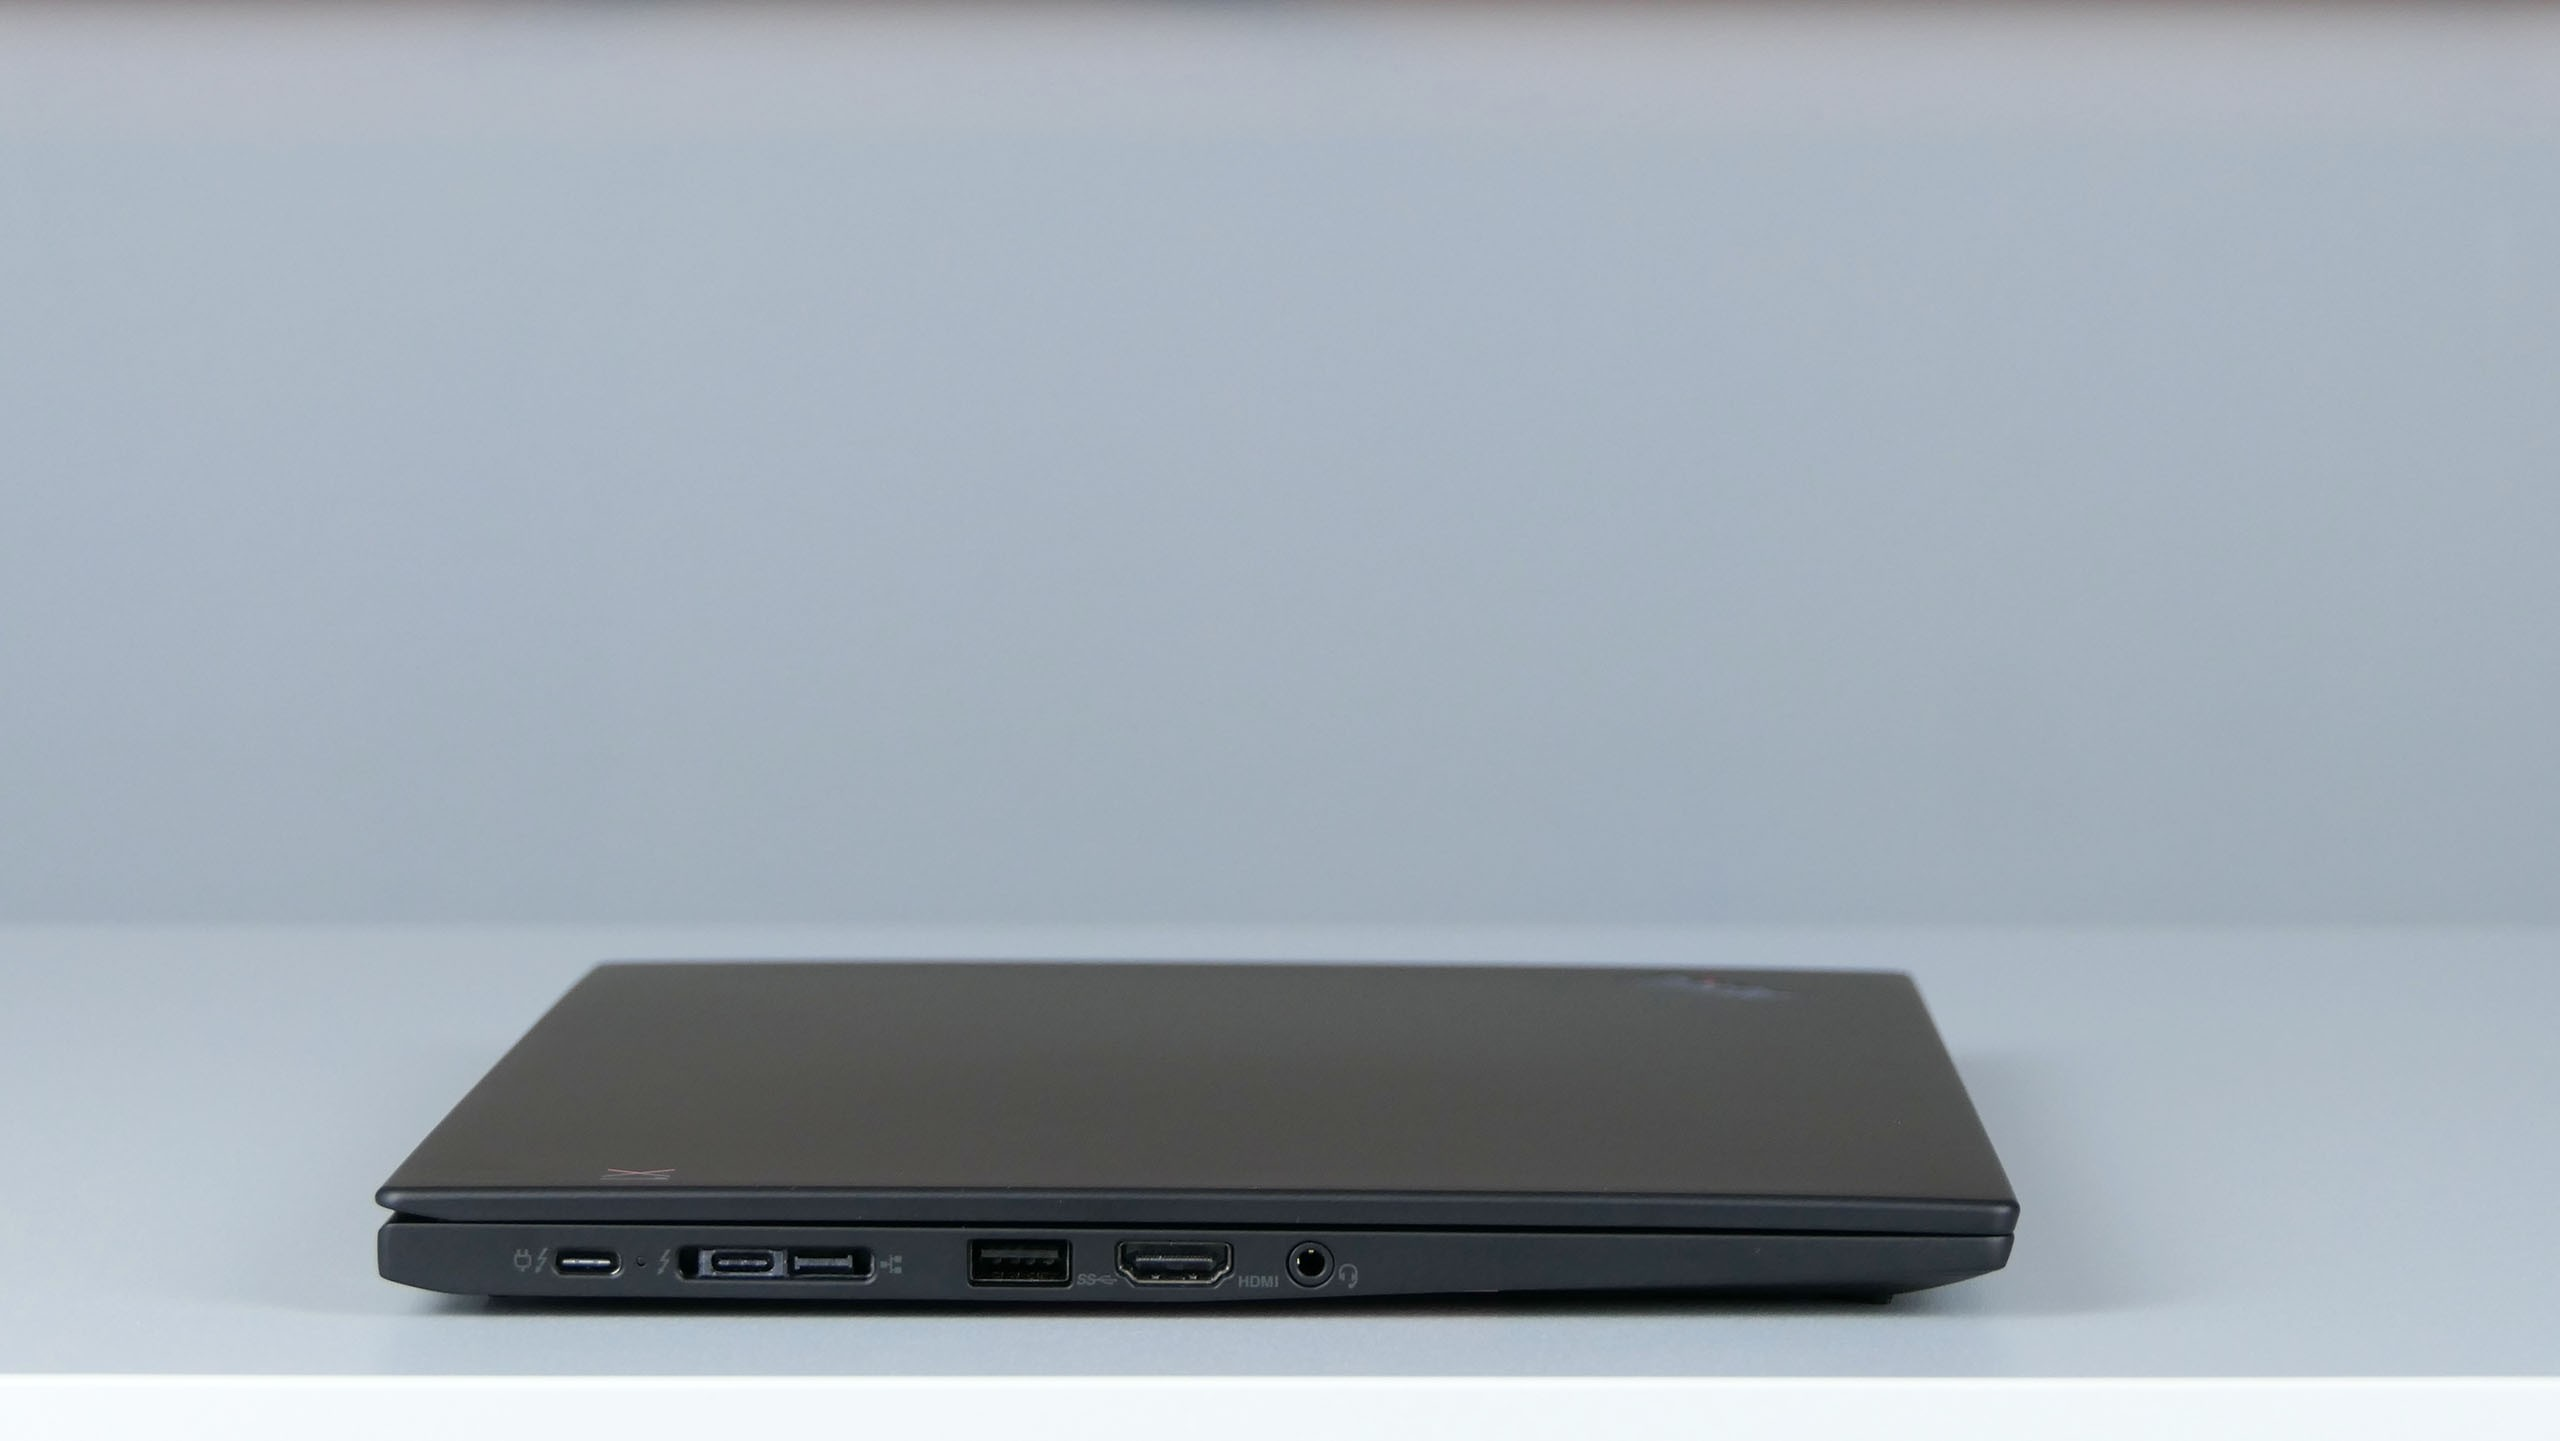 Lenovo ThinkPad X1 Carbon 7th gen - prawy bok